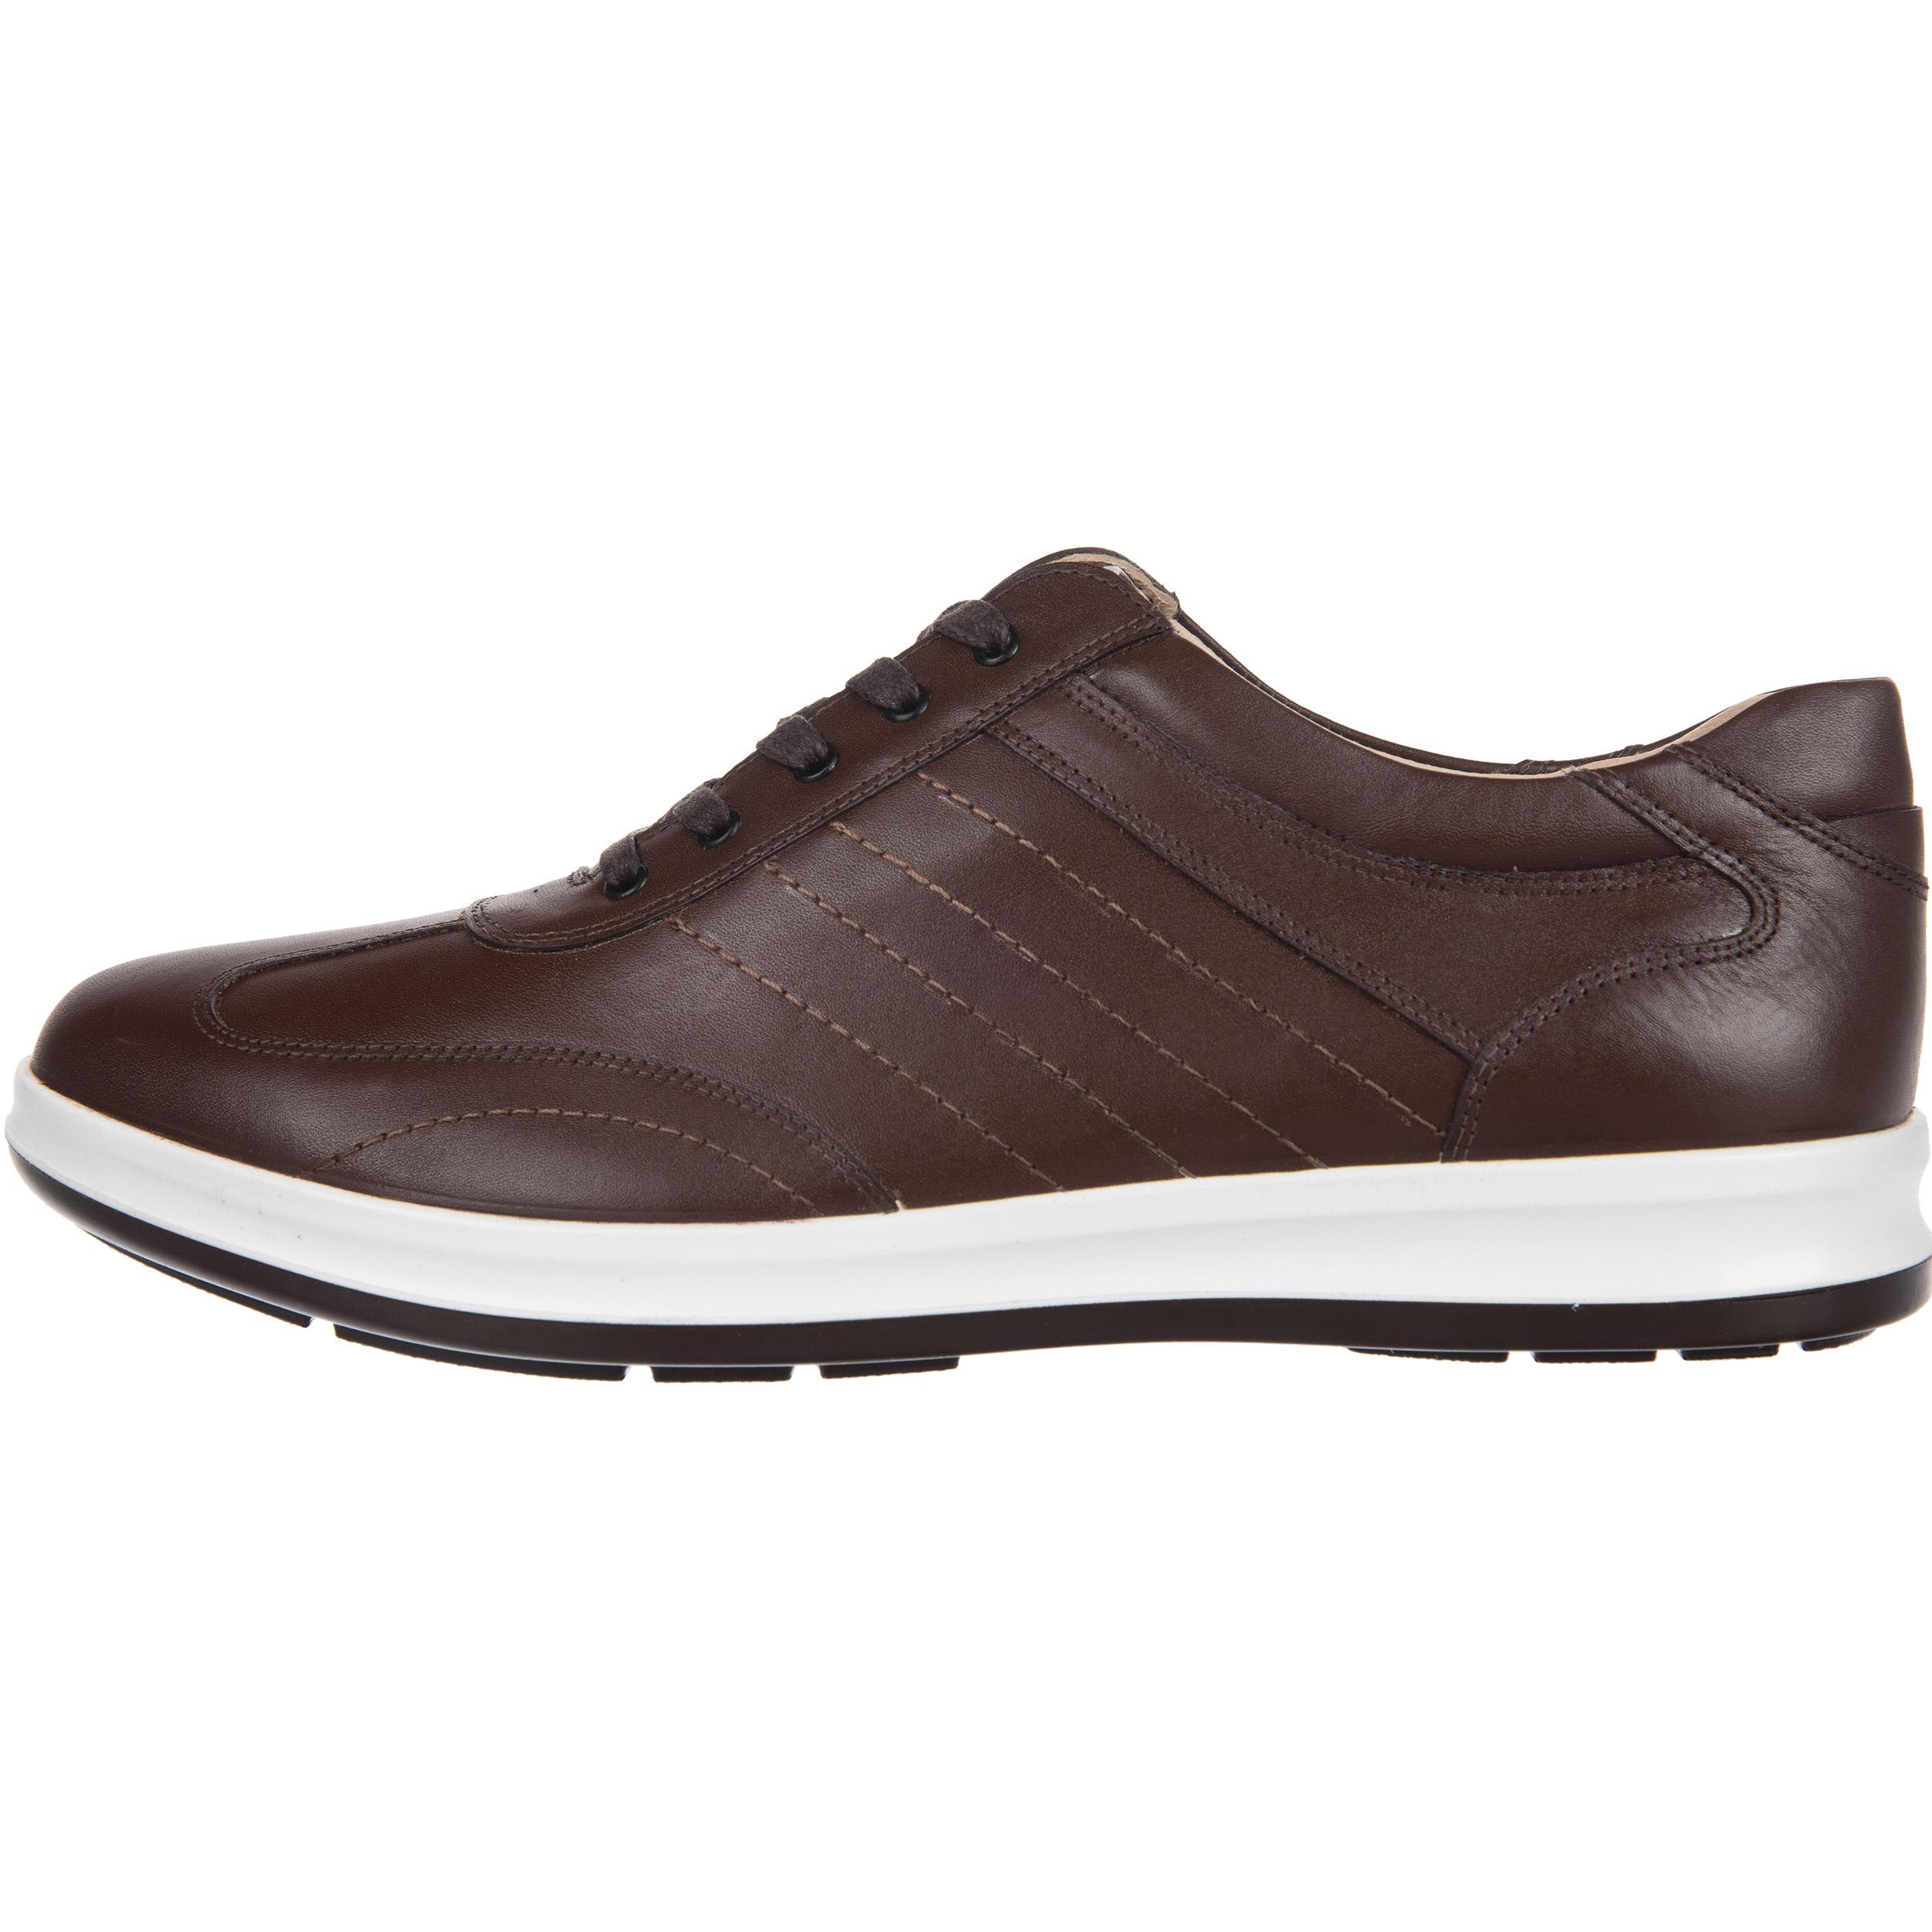 کفش مردانه دنیلی مدل 113070311373